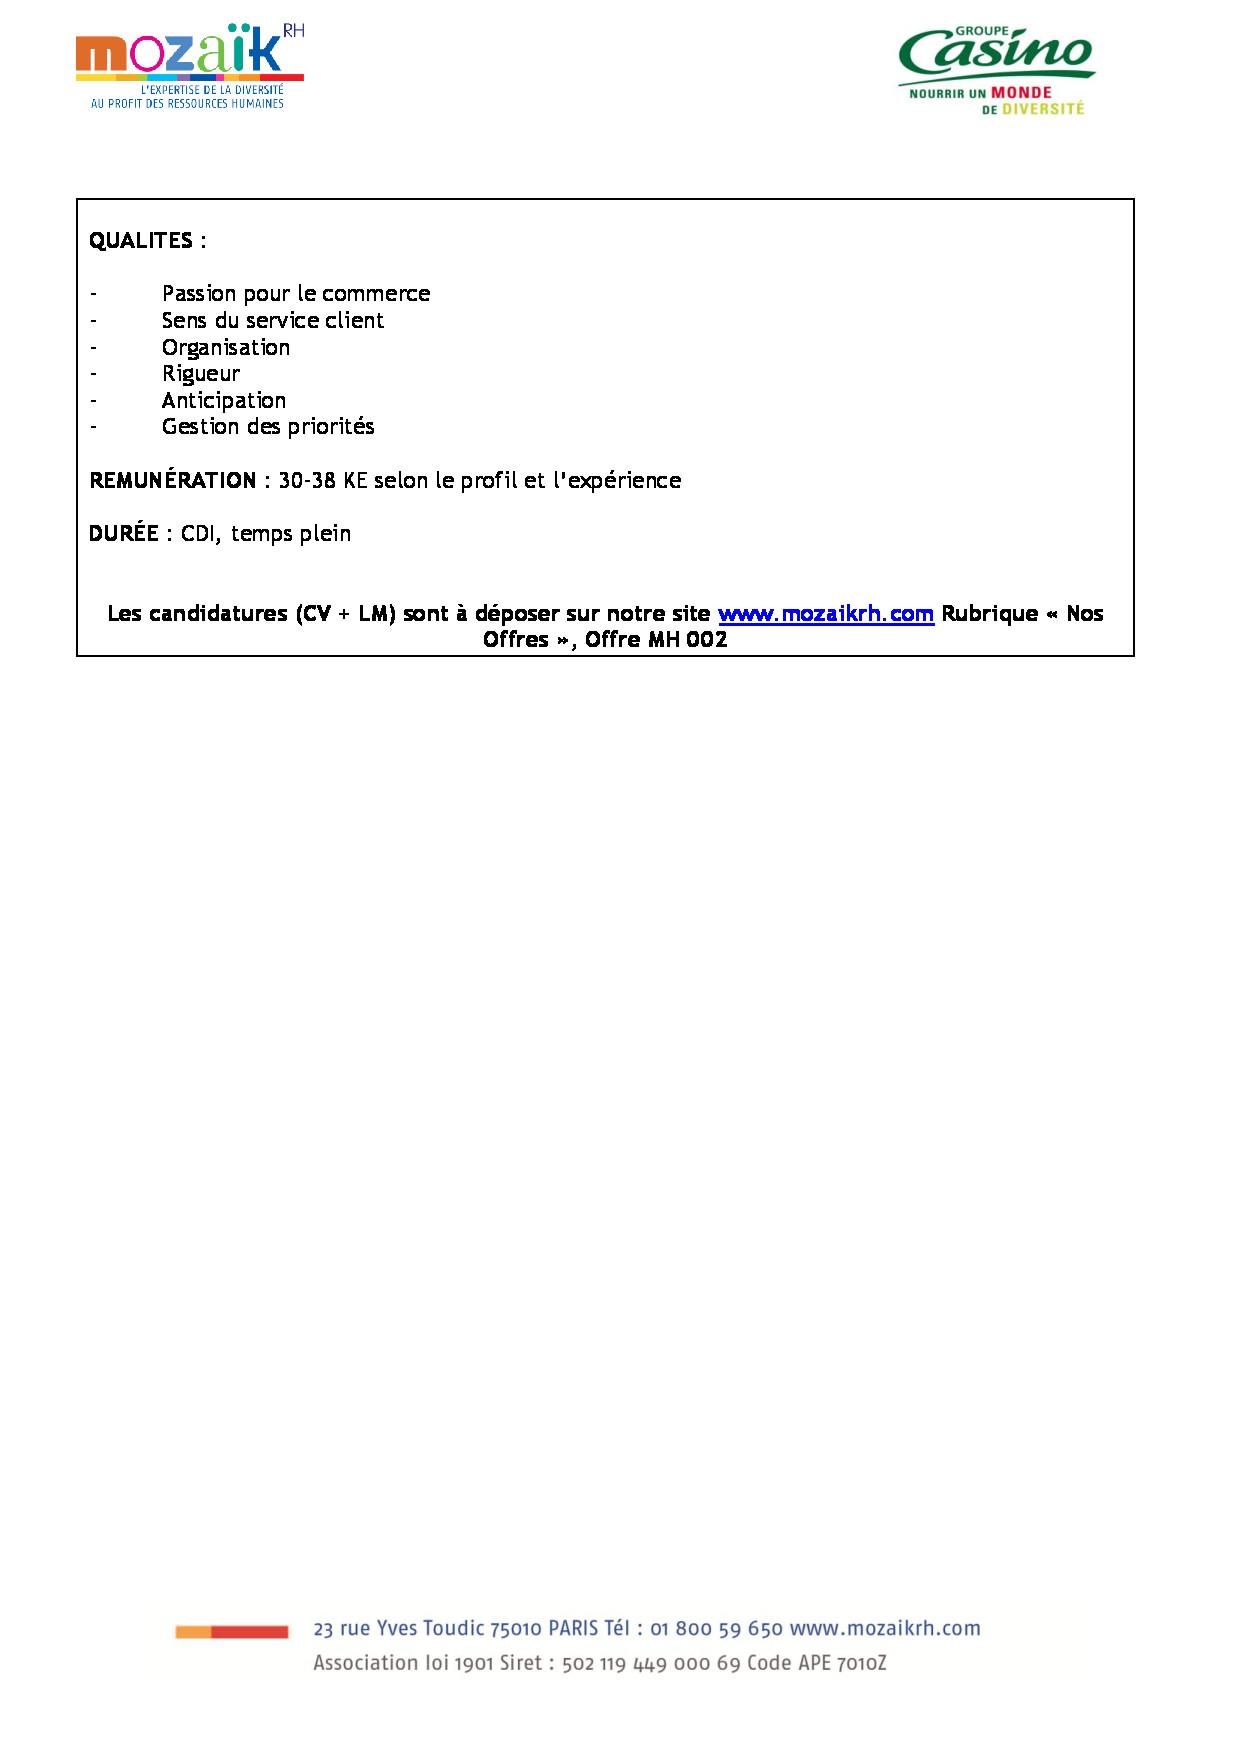 FDP Directeur de Magasin Leader Price_V3 suite